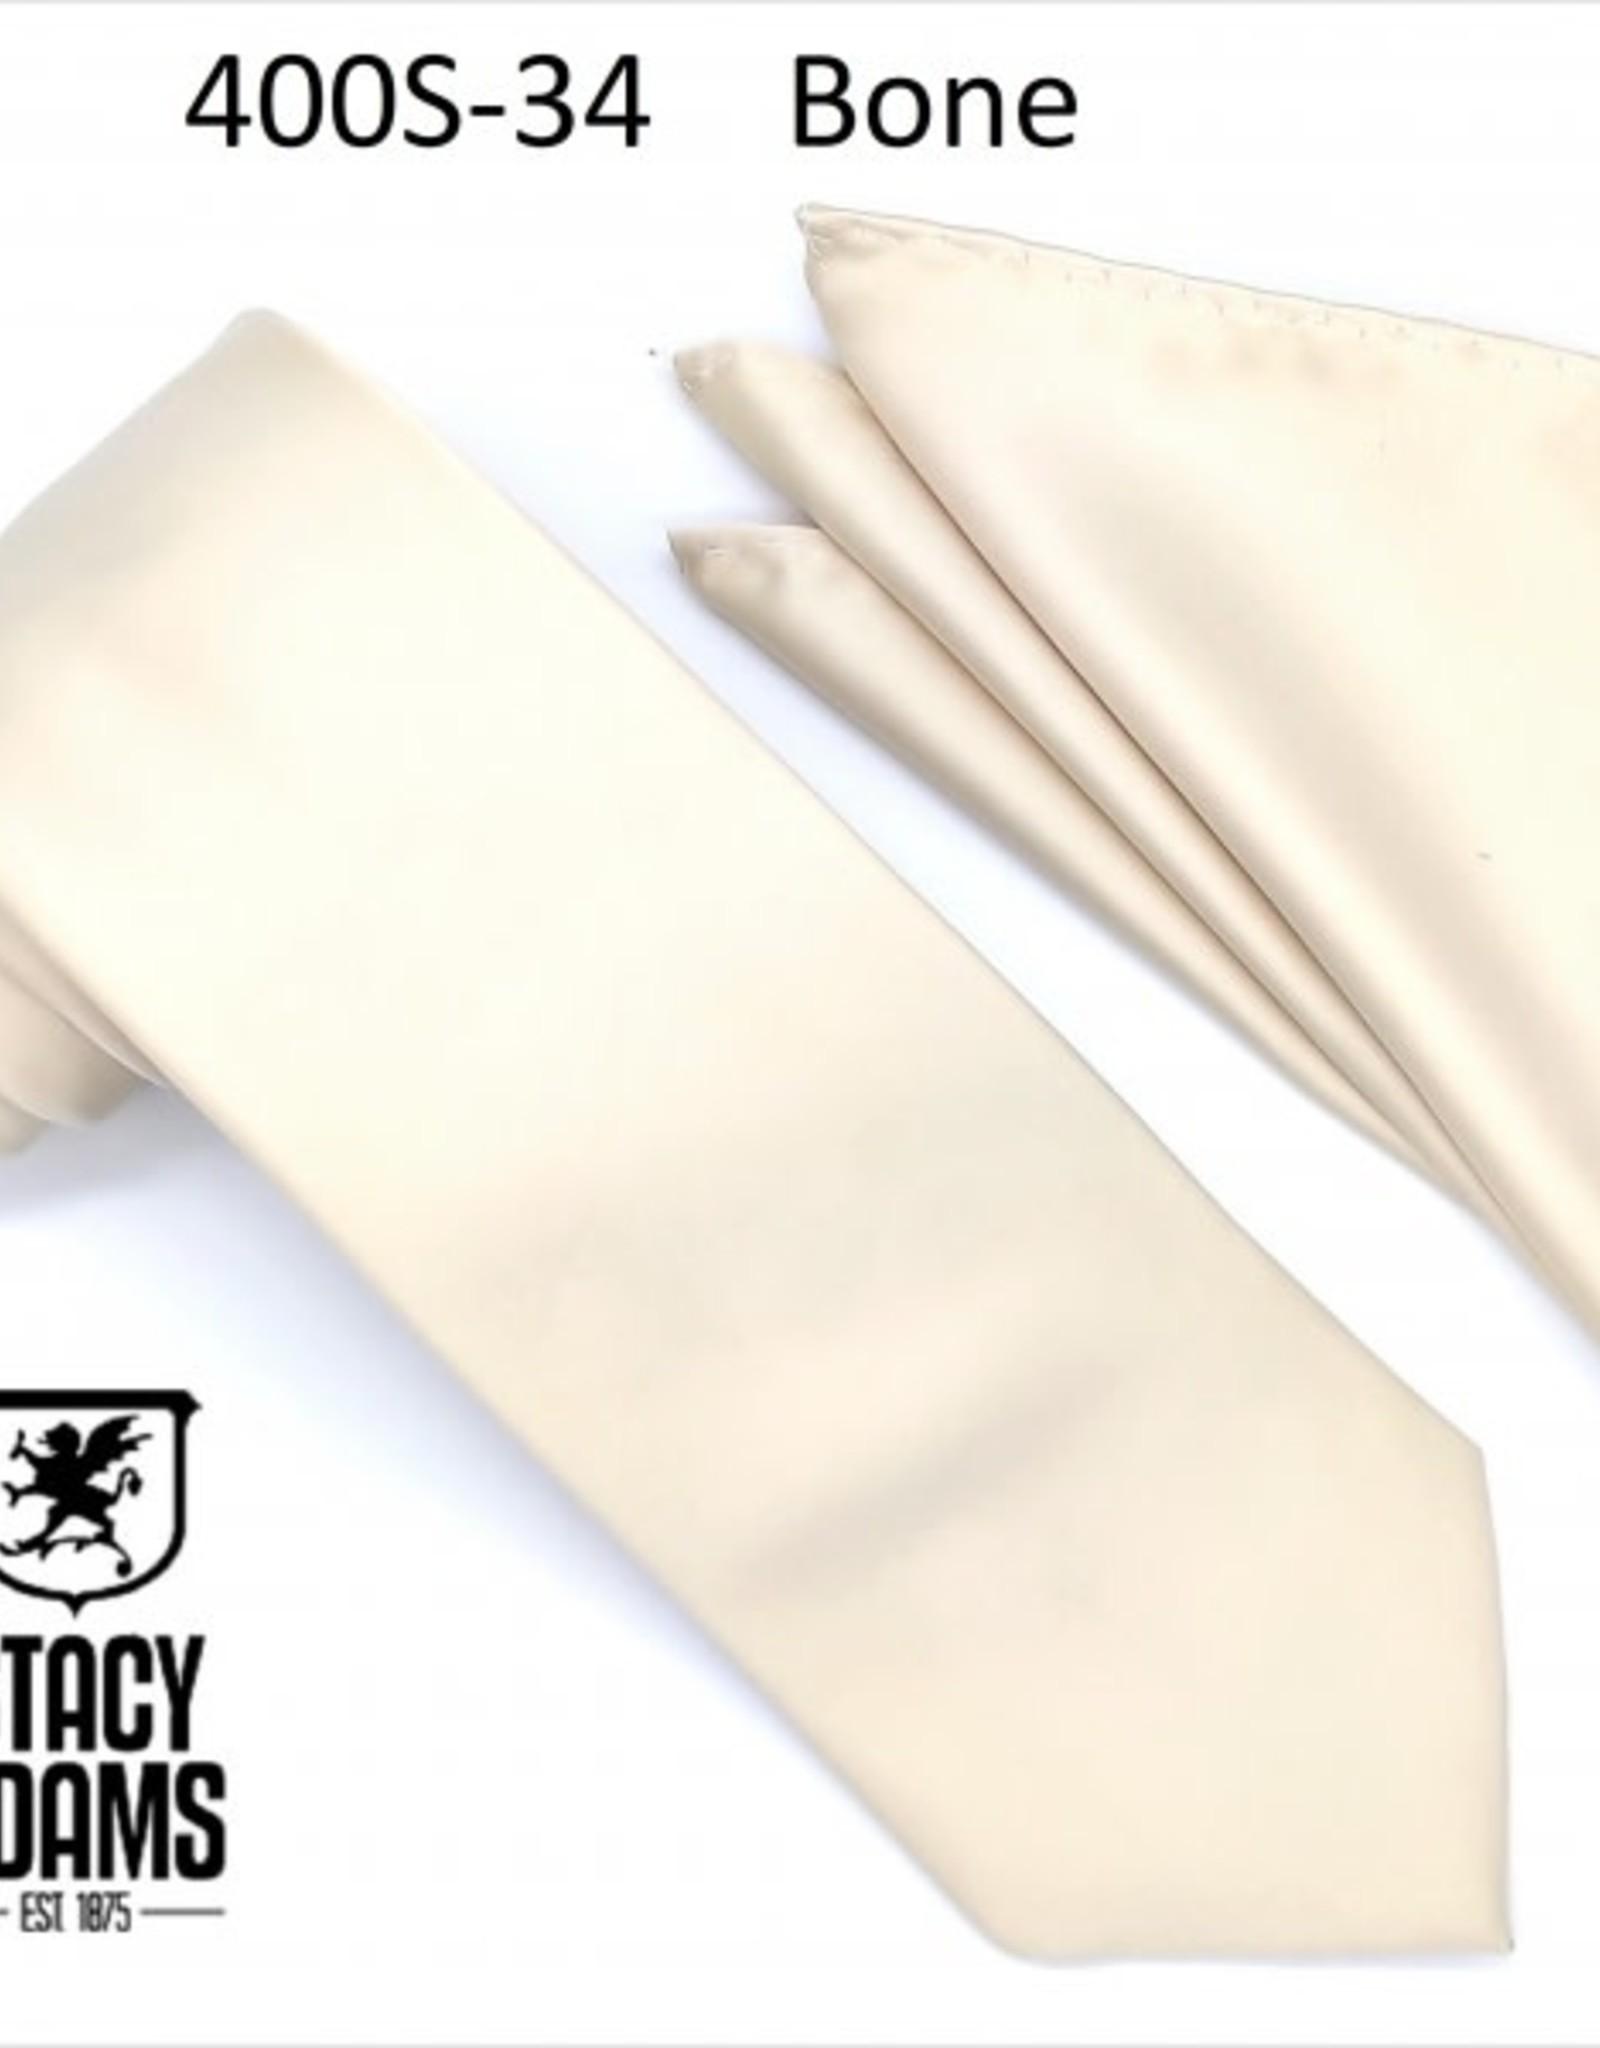 Stacy Adams Tie Stacy Adams Reg 400S-34 Bone